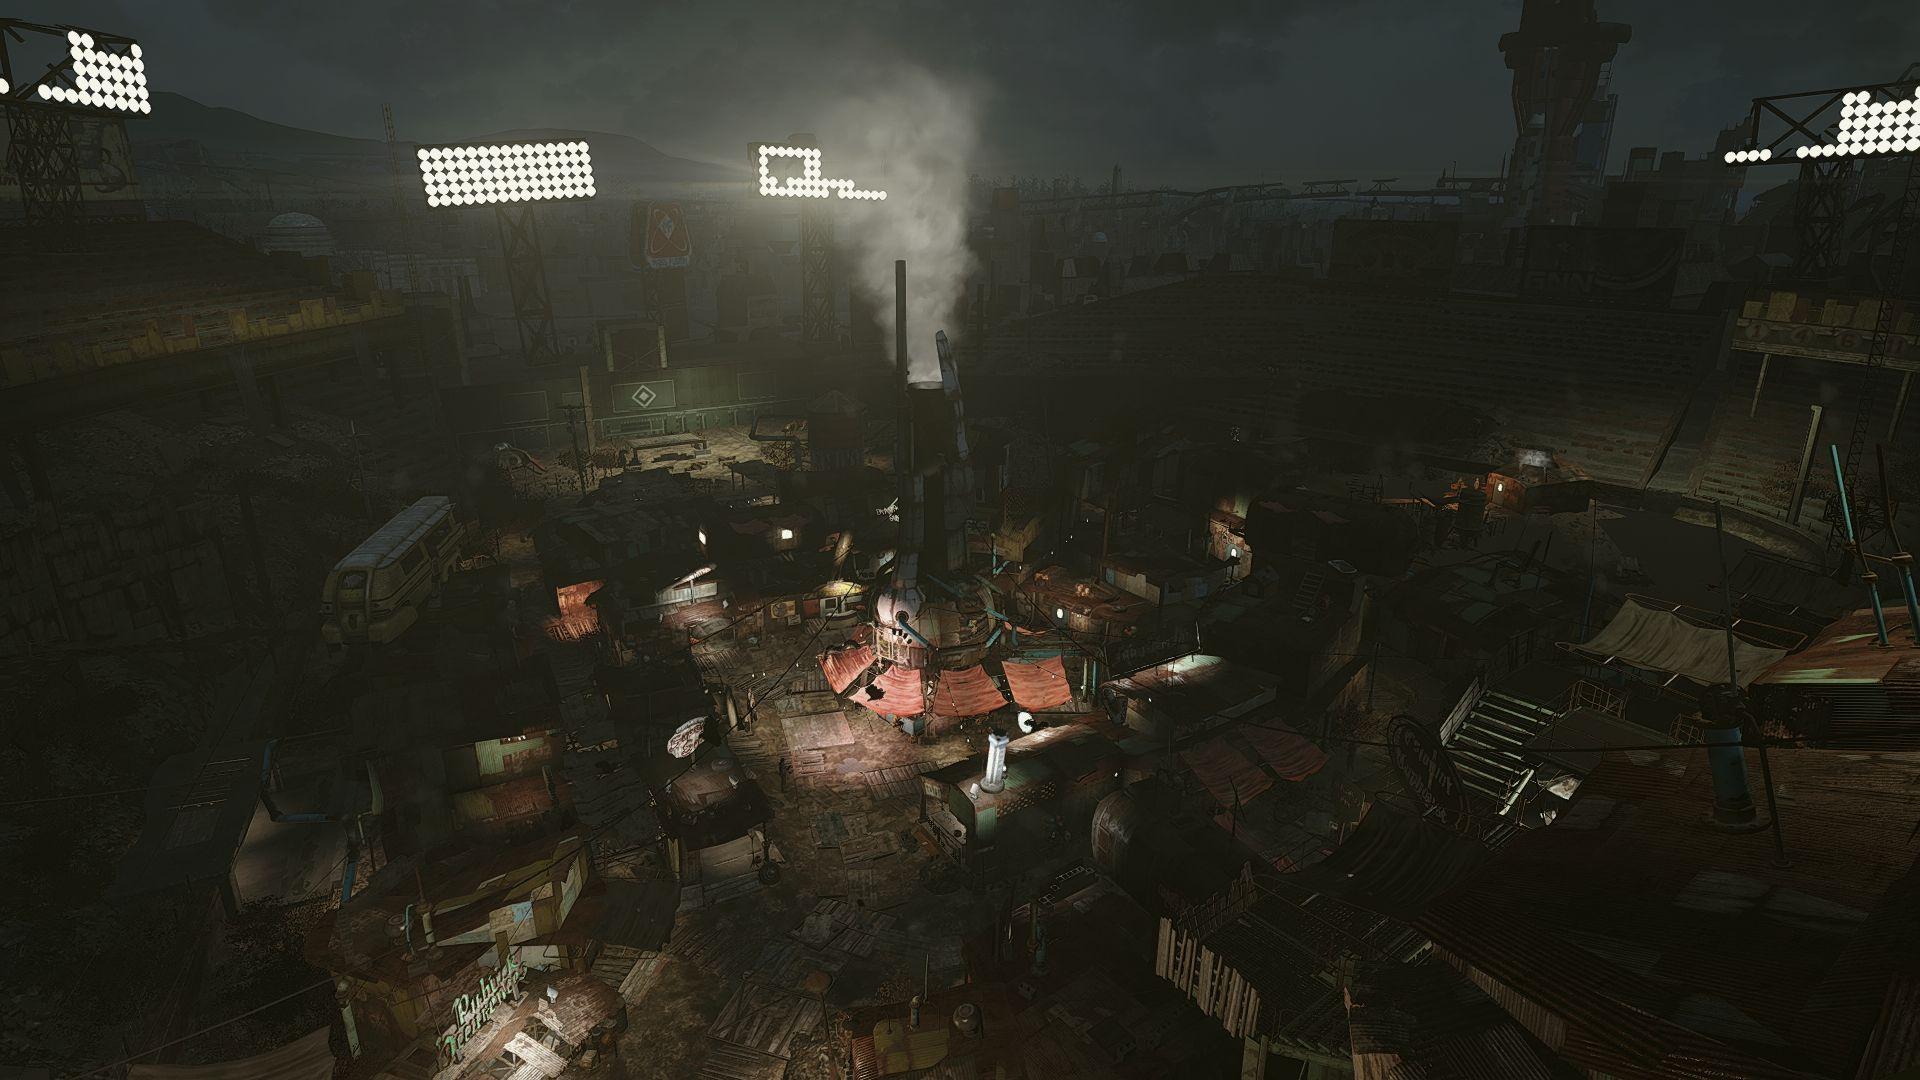 Fallout4 2020-05-22 03-34-18.jpg